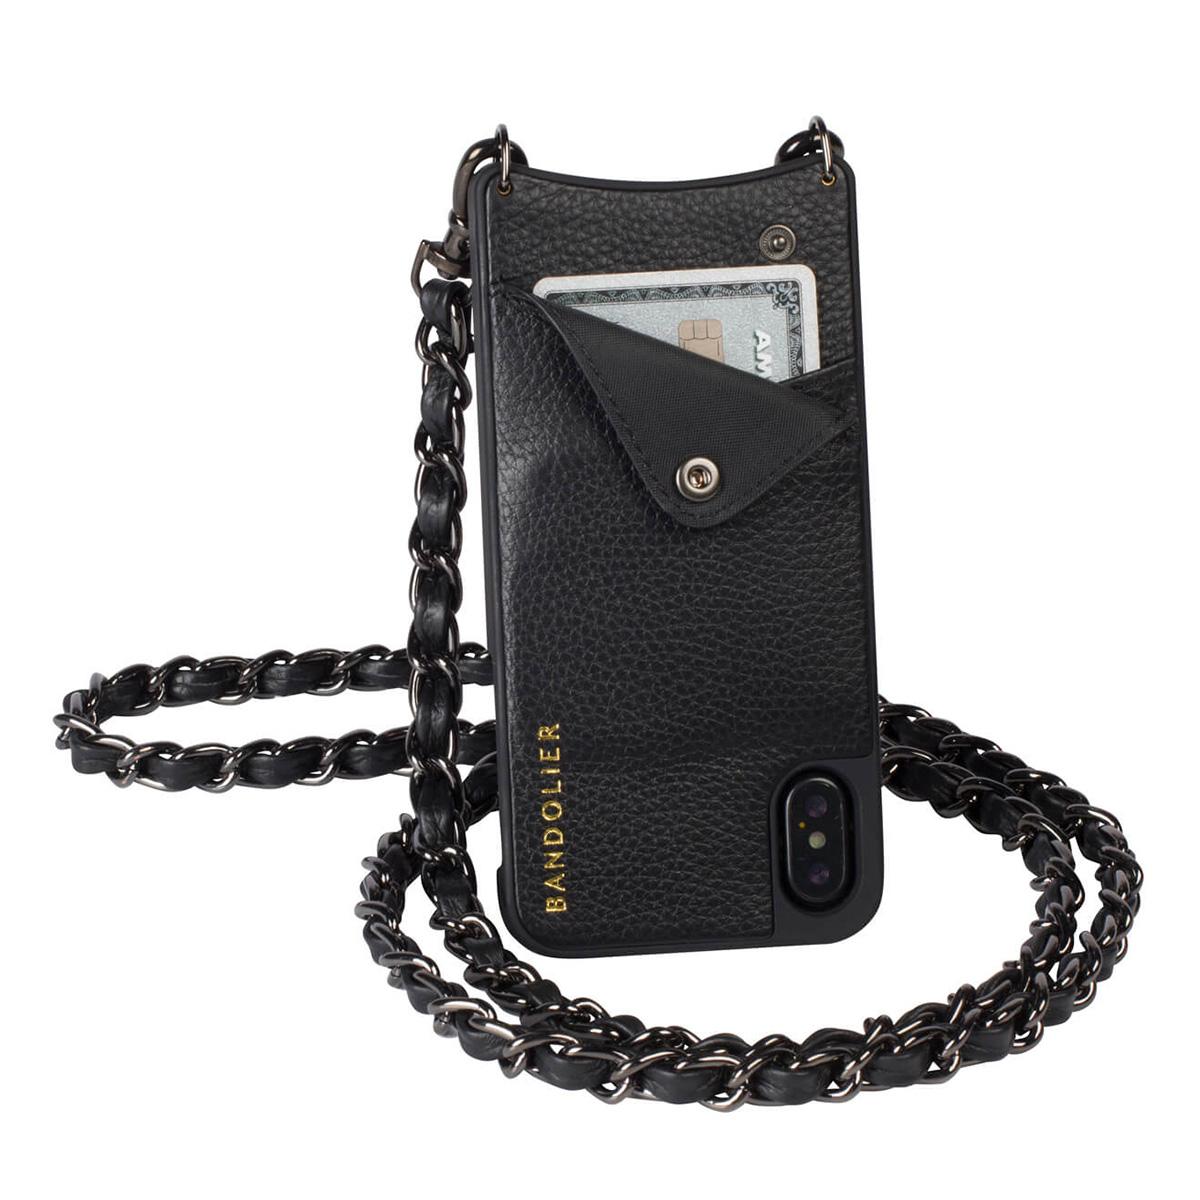 BANDOLIER iPhone SE 8 7 6 6s/Plus ケース スマホ 携帯 アイフォン プラス LUCY PEWTER メンズ レディース